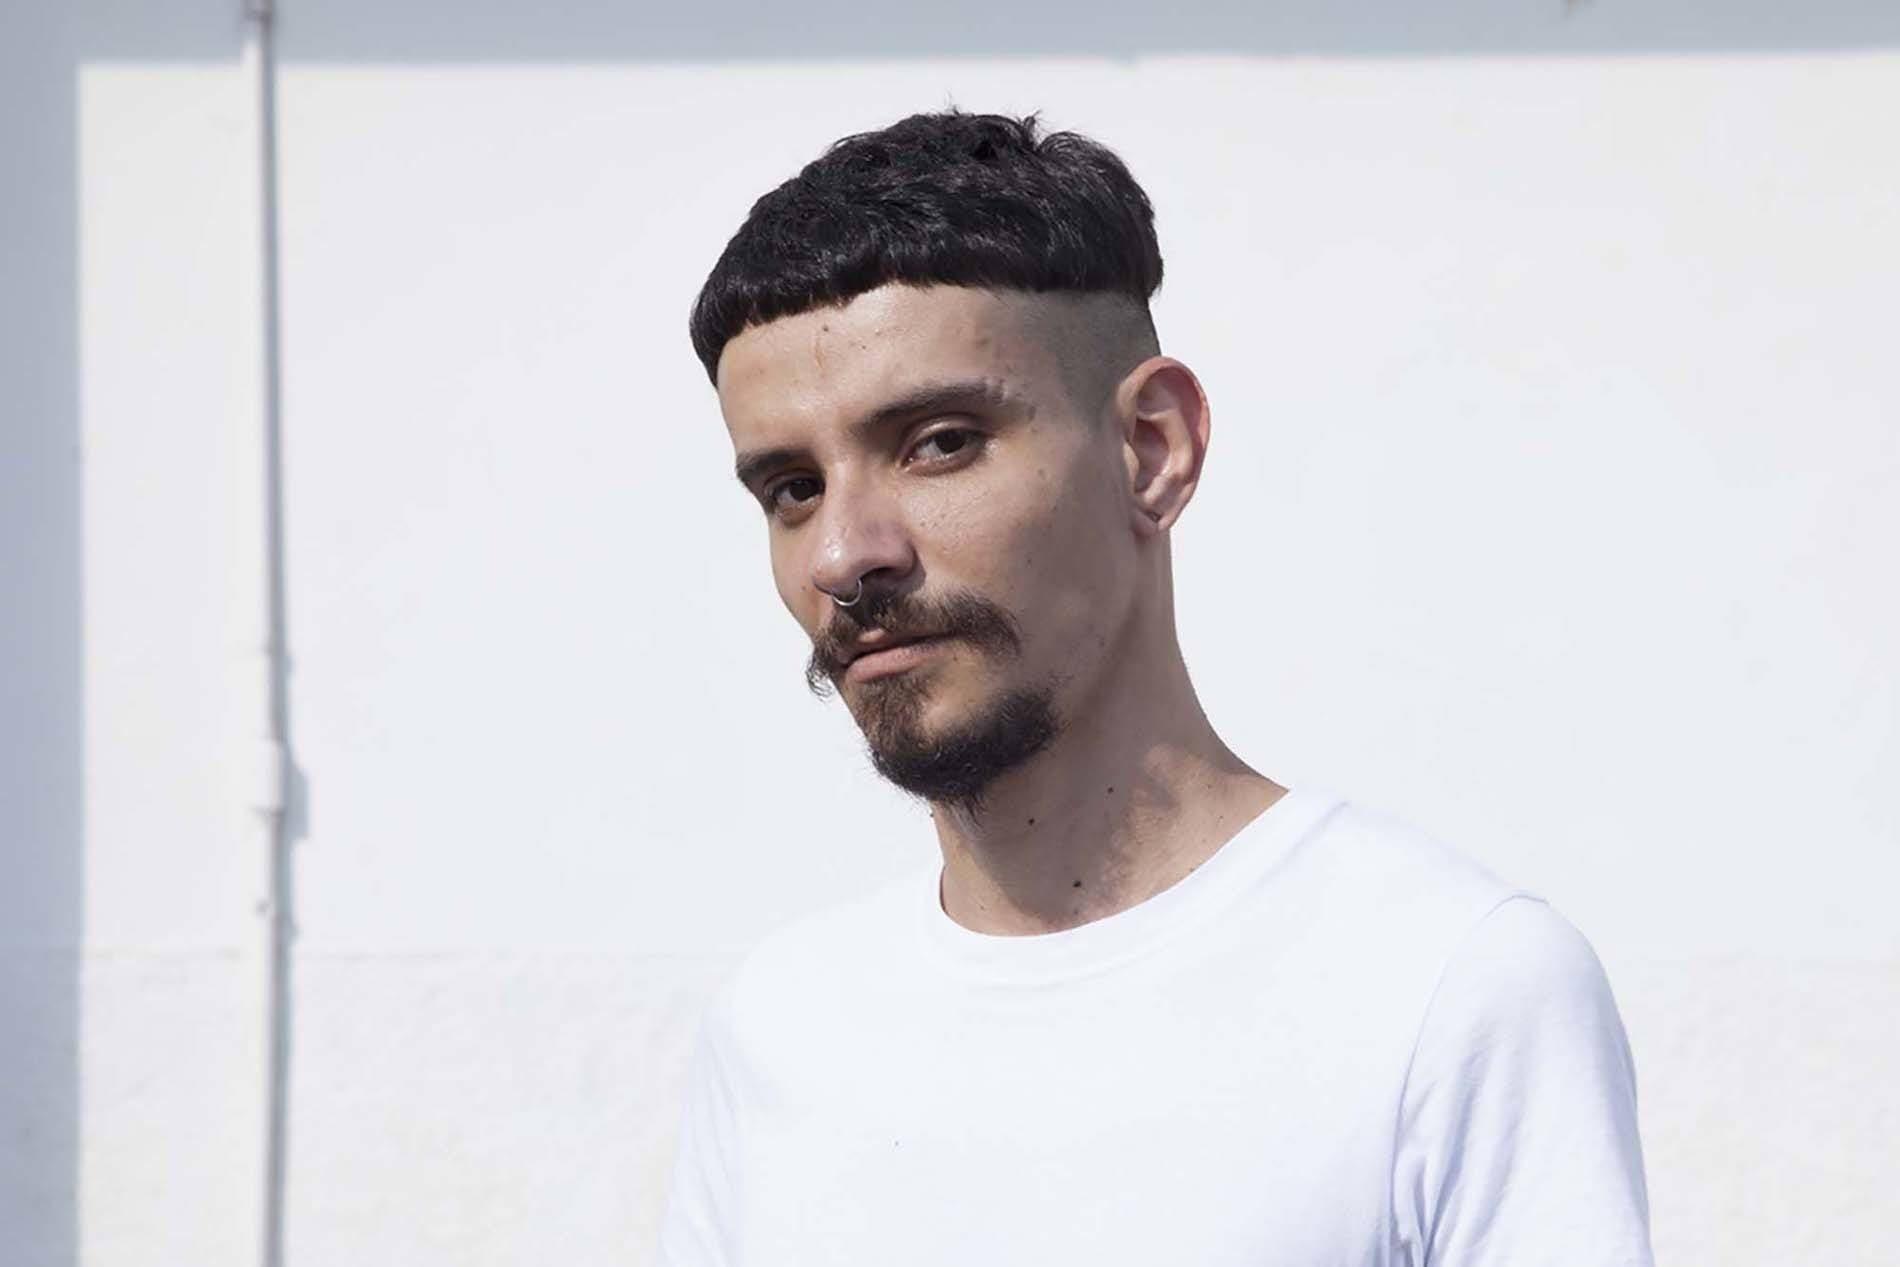 Gaya rambut pendek pria caesar haircut